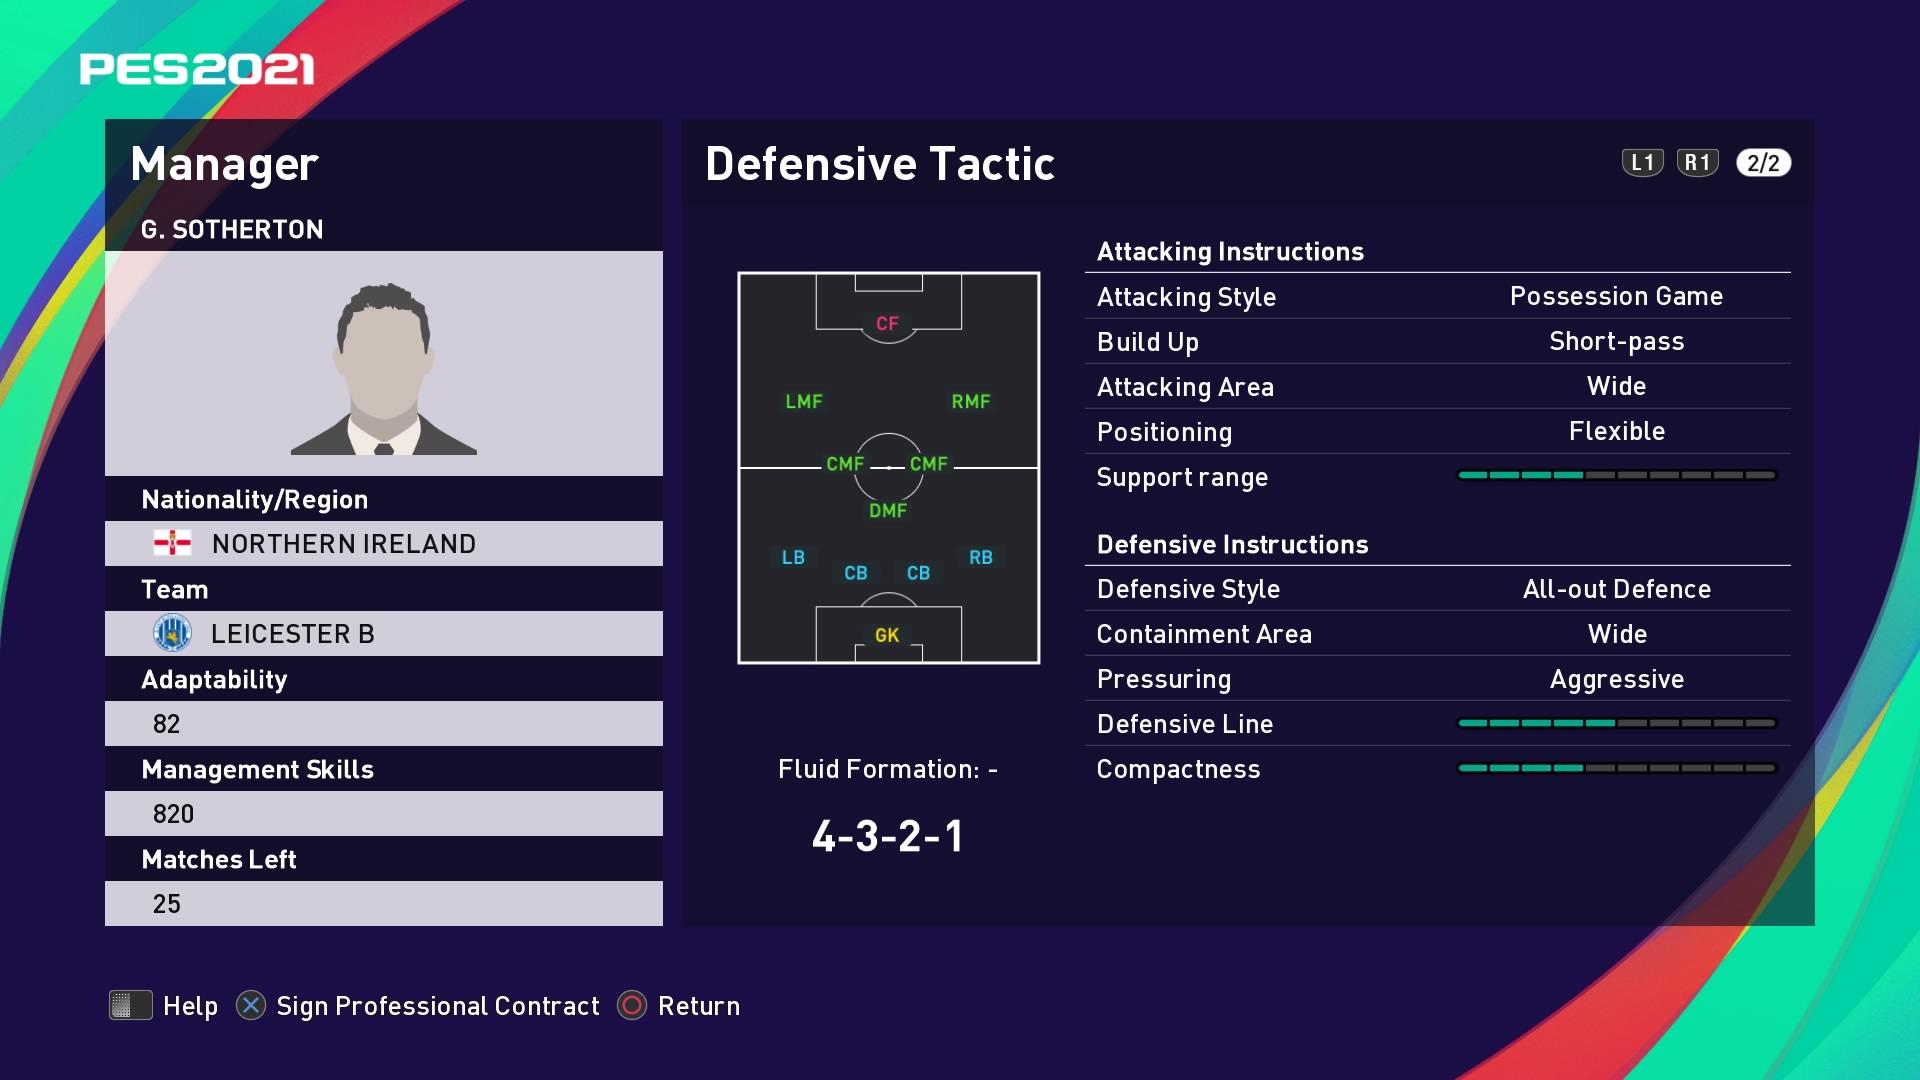 G. Sotherton (Brendan Rodgers) Defensive Tactic in PES 2021 myClub